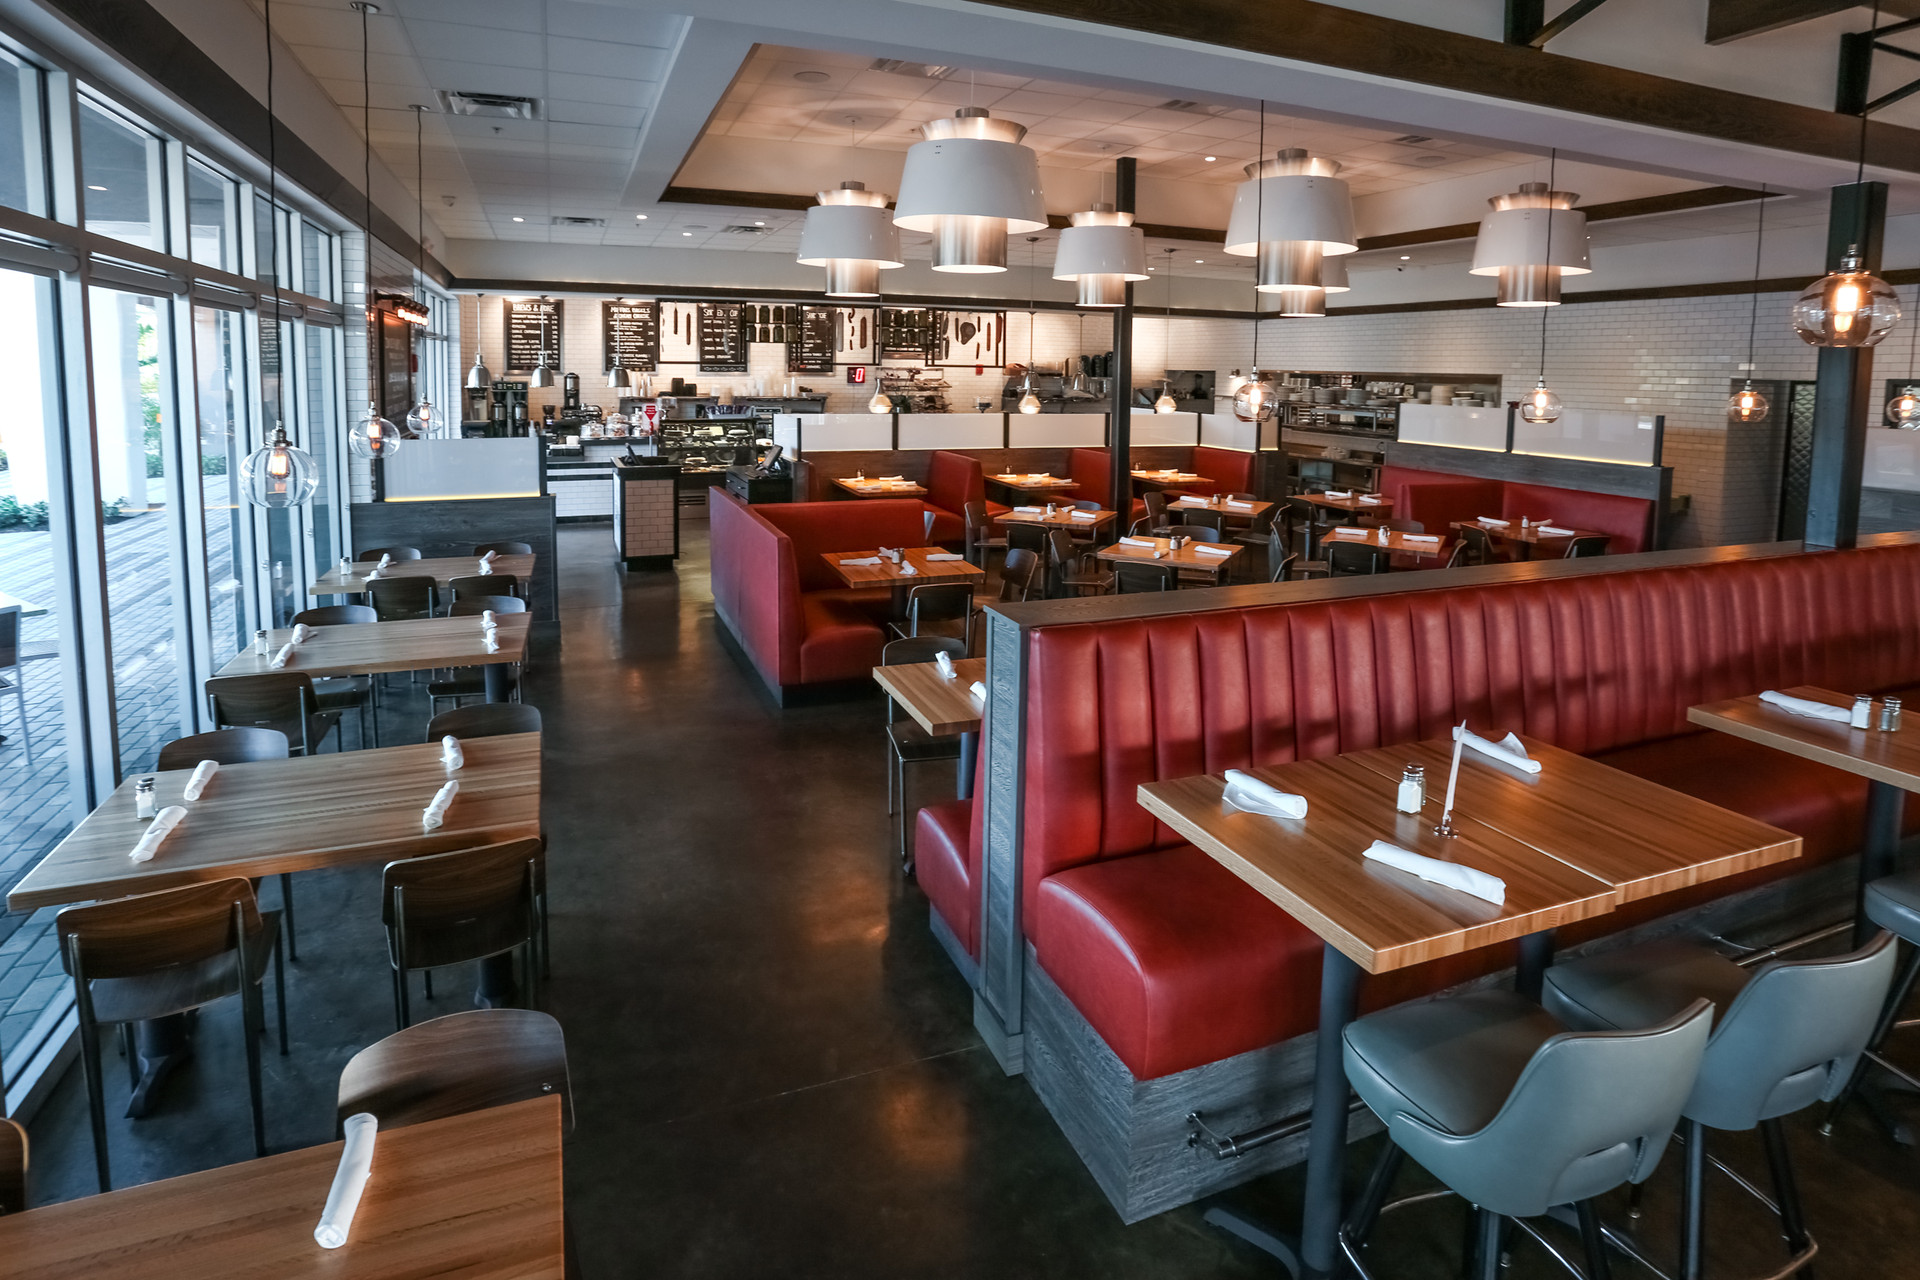 Rappy's_Dining Room Overhead.jpg